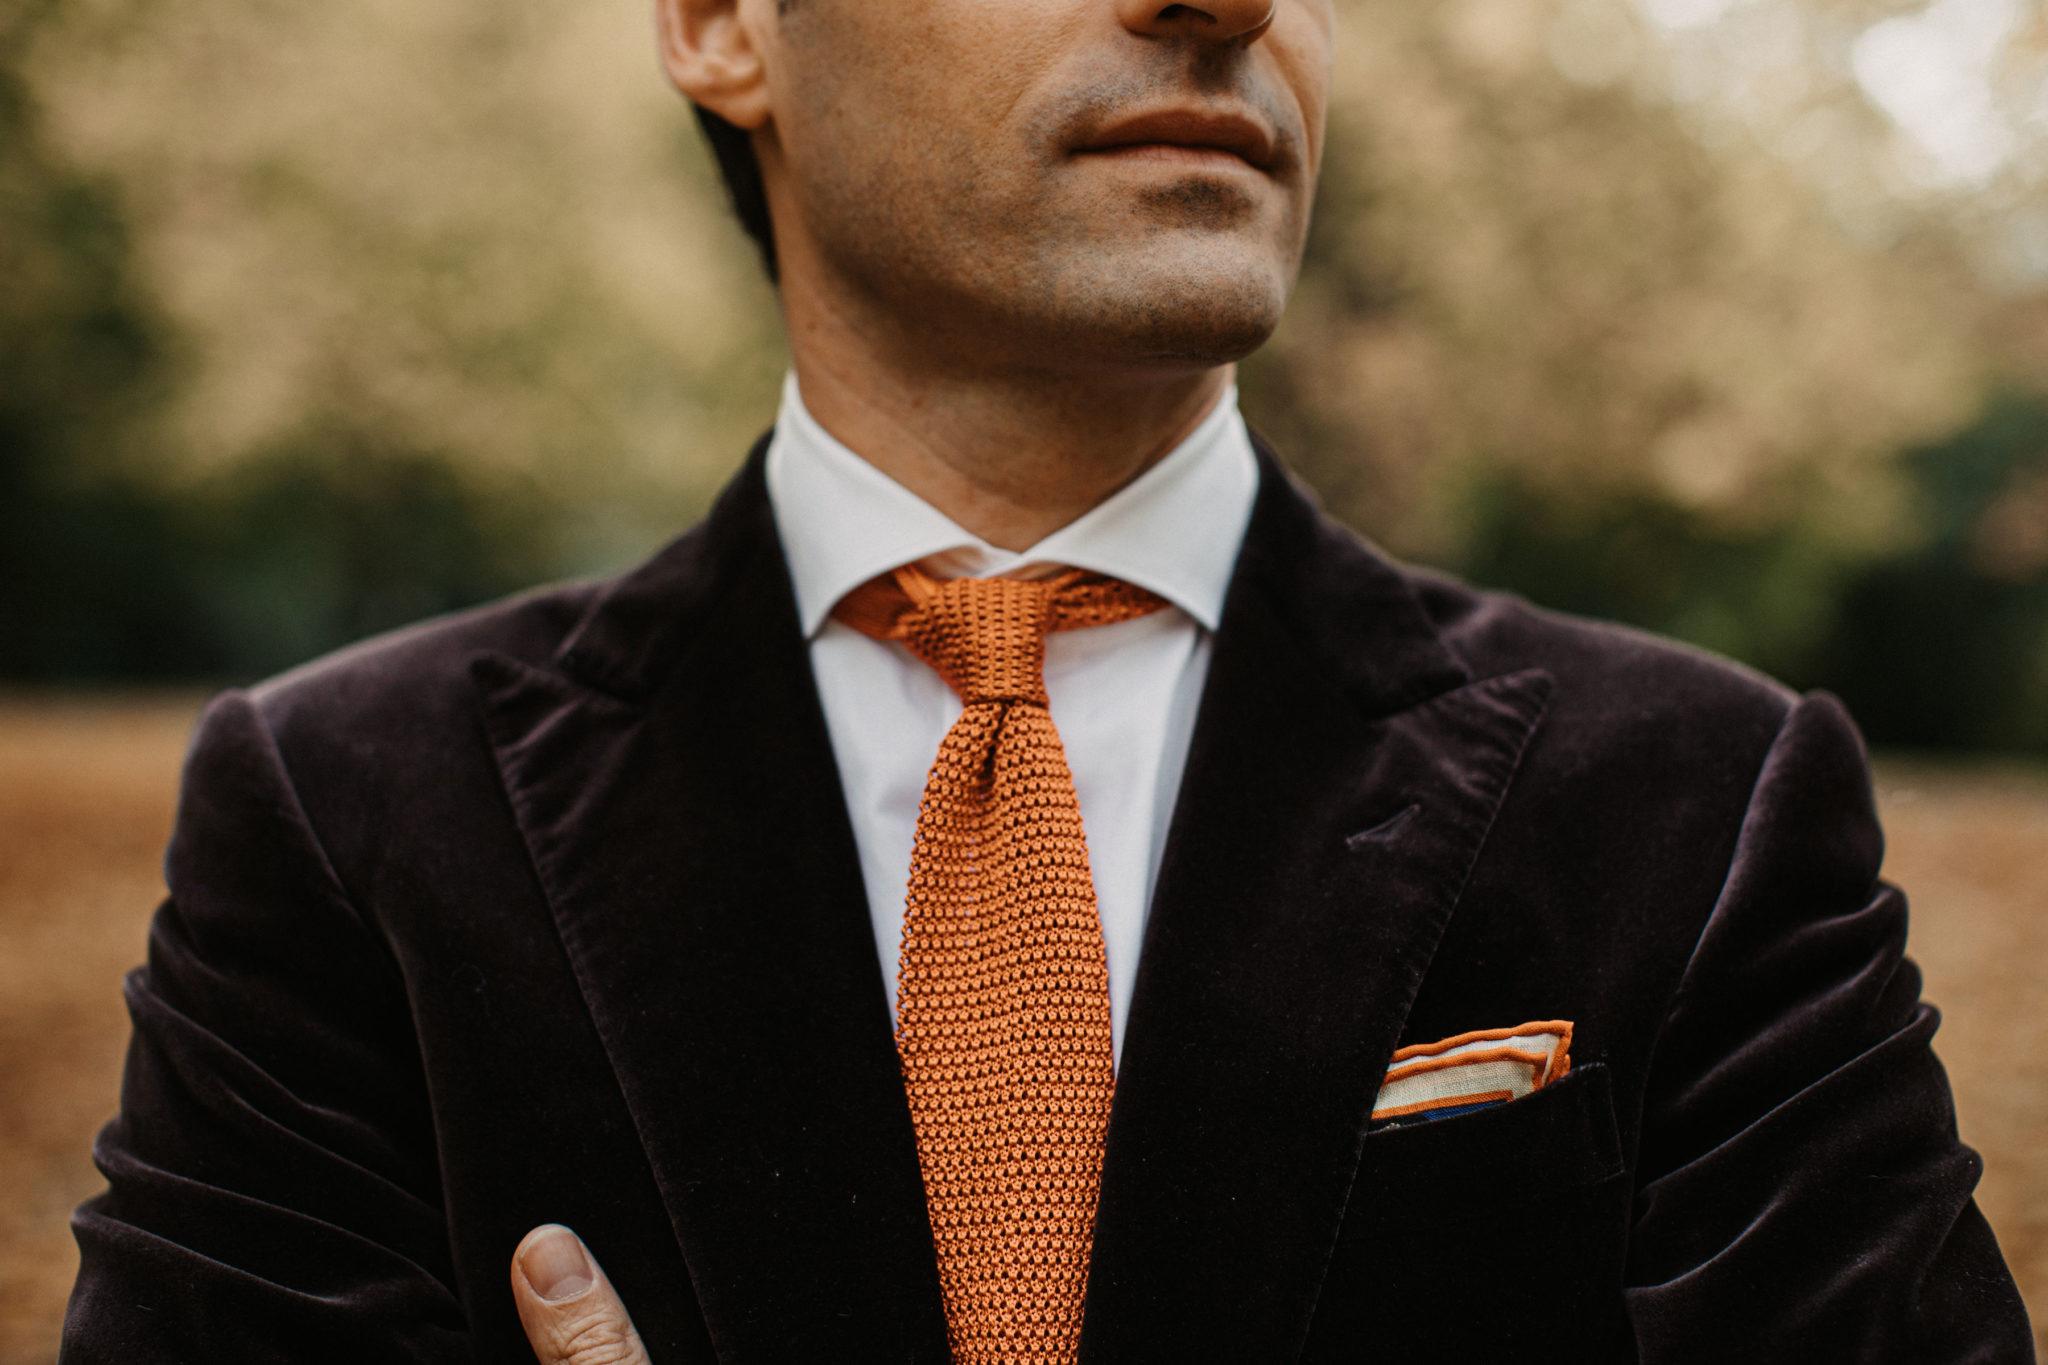 Detail of Dalbiondo Tailoring custom white shirt, rust knit tie and velvet jacket's lapels